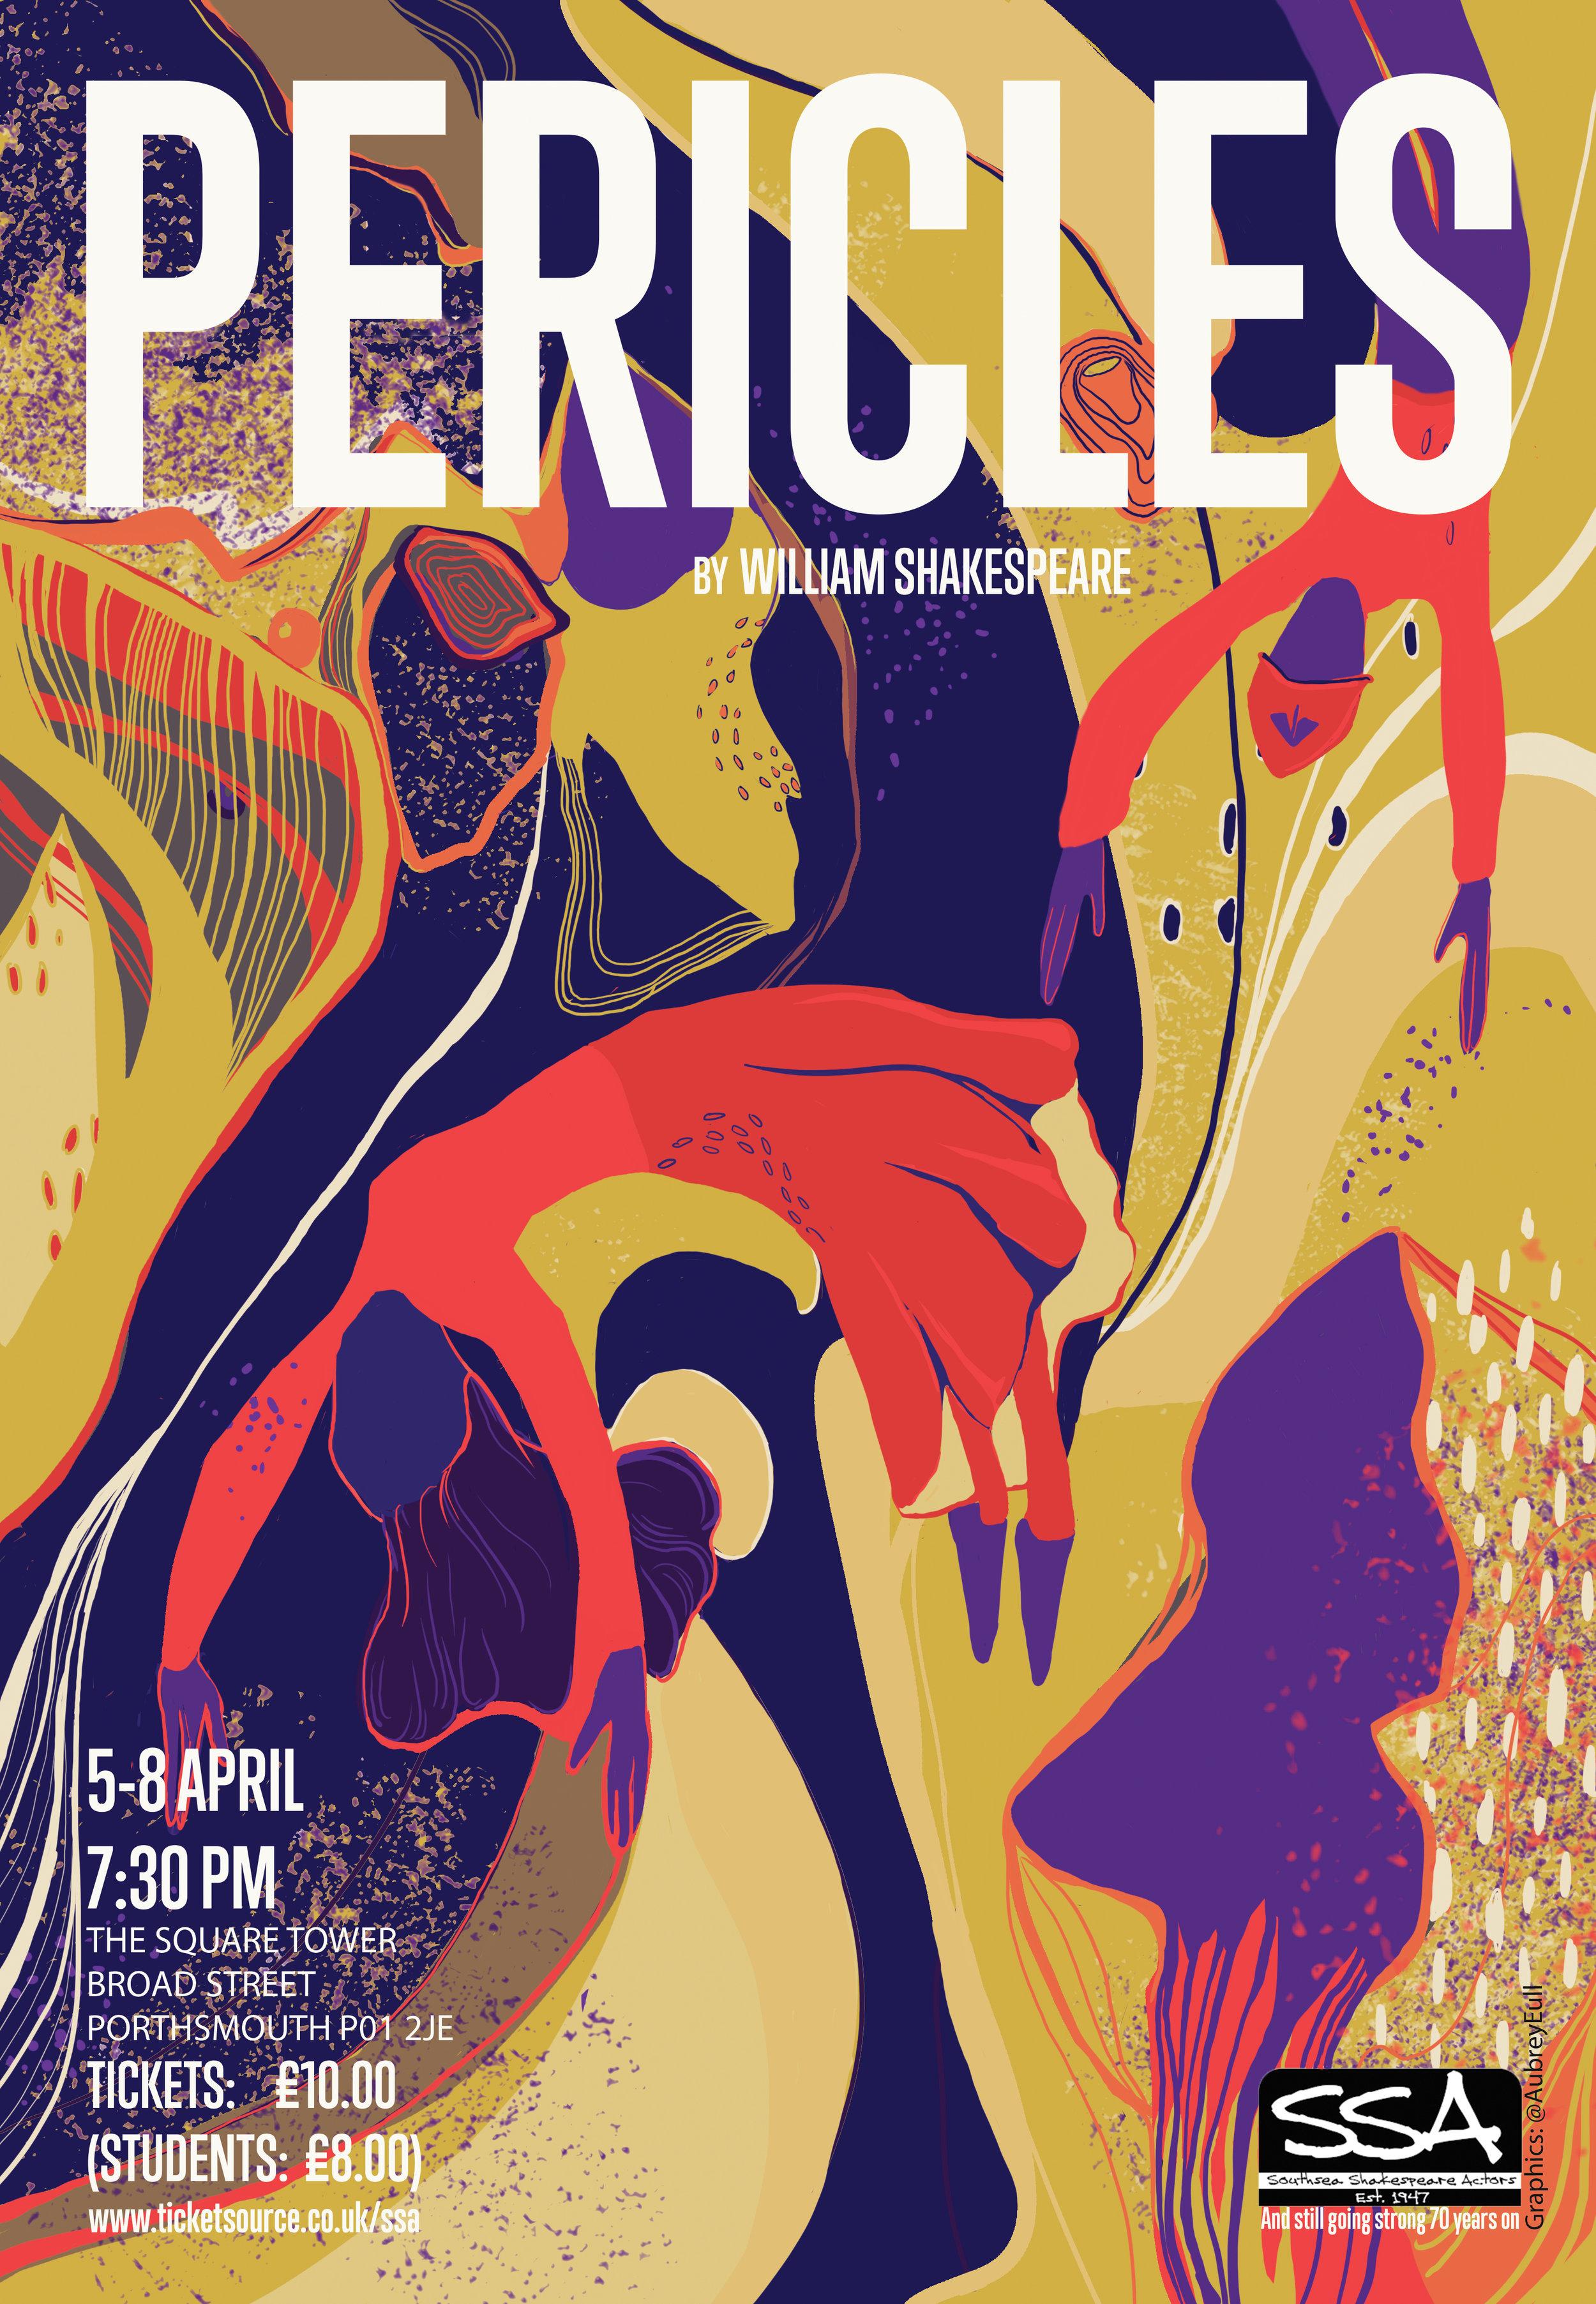 Pericles-poster-finaloriginalRGB.jpg